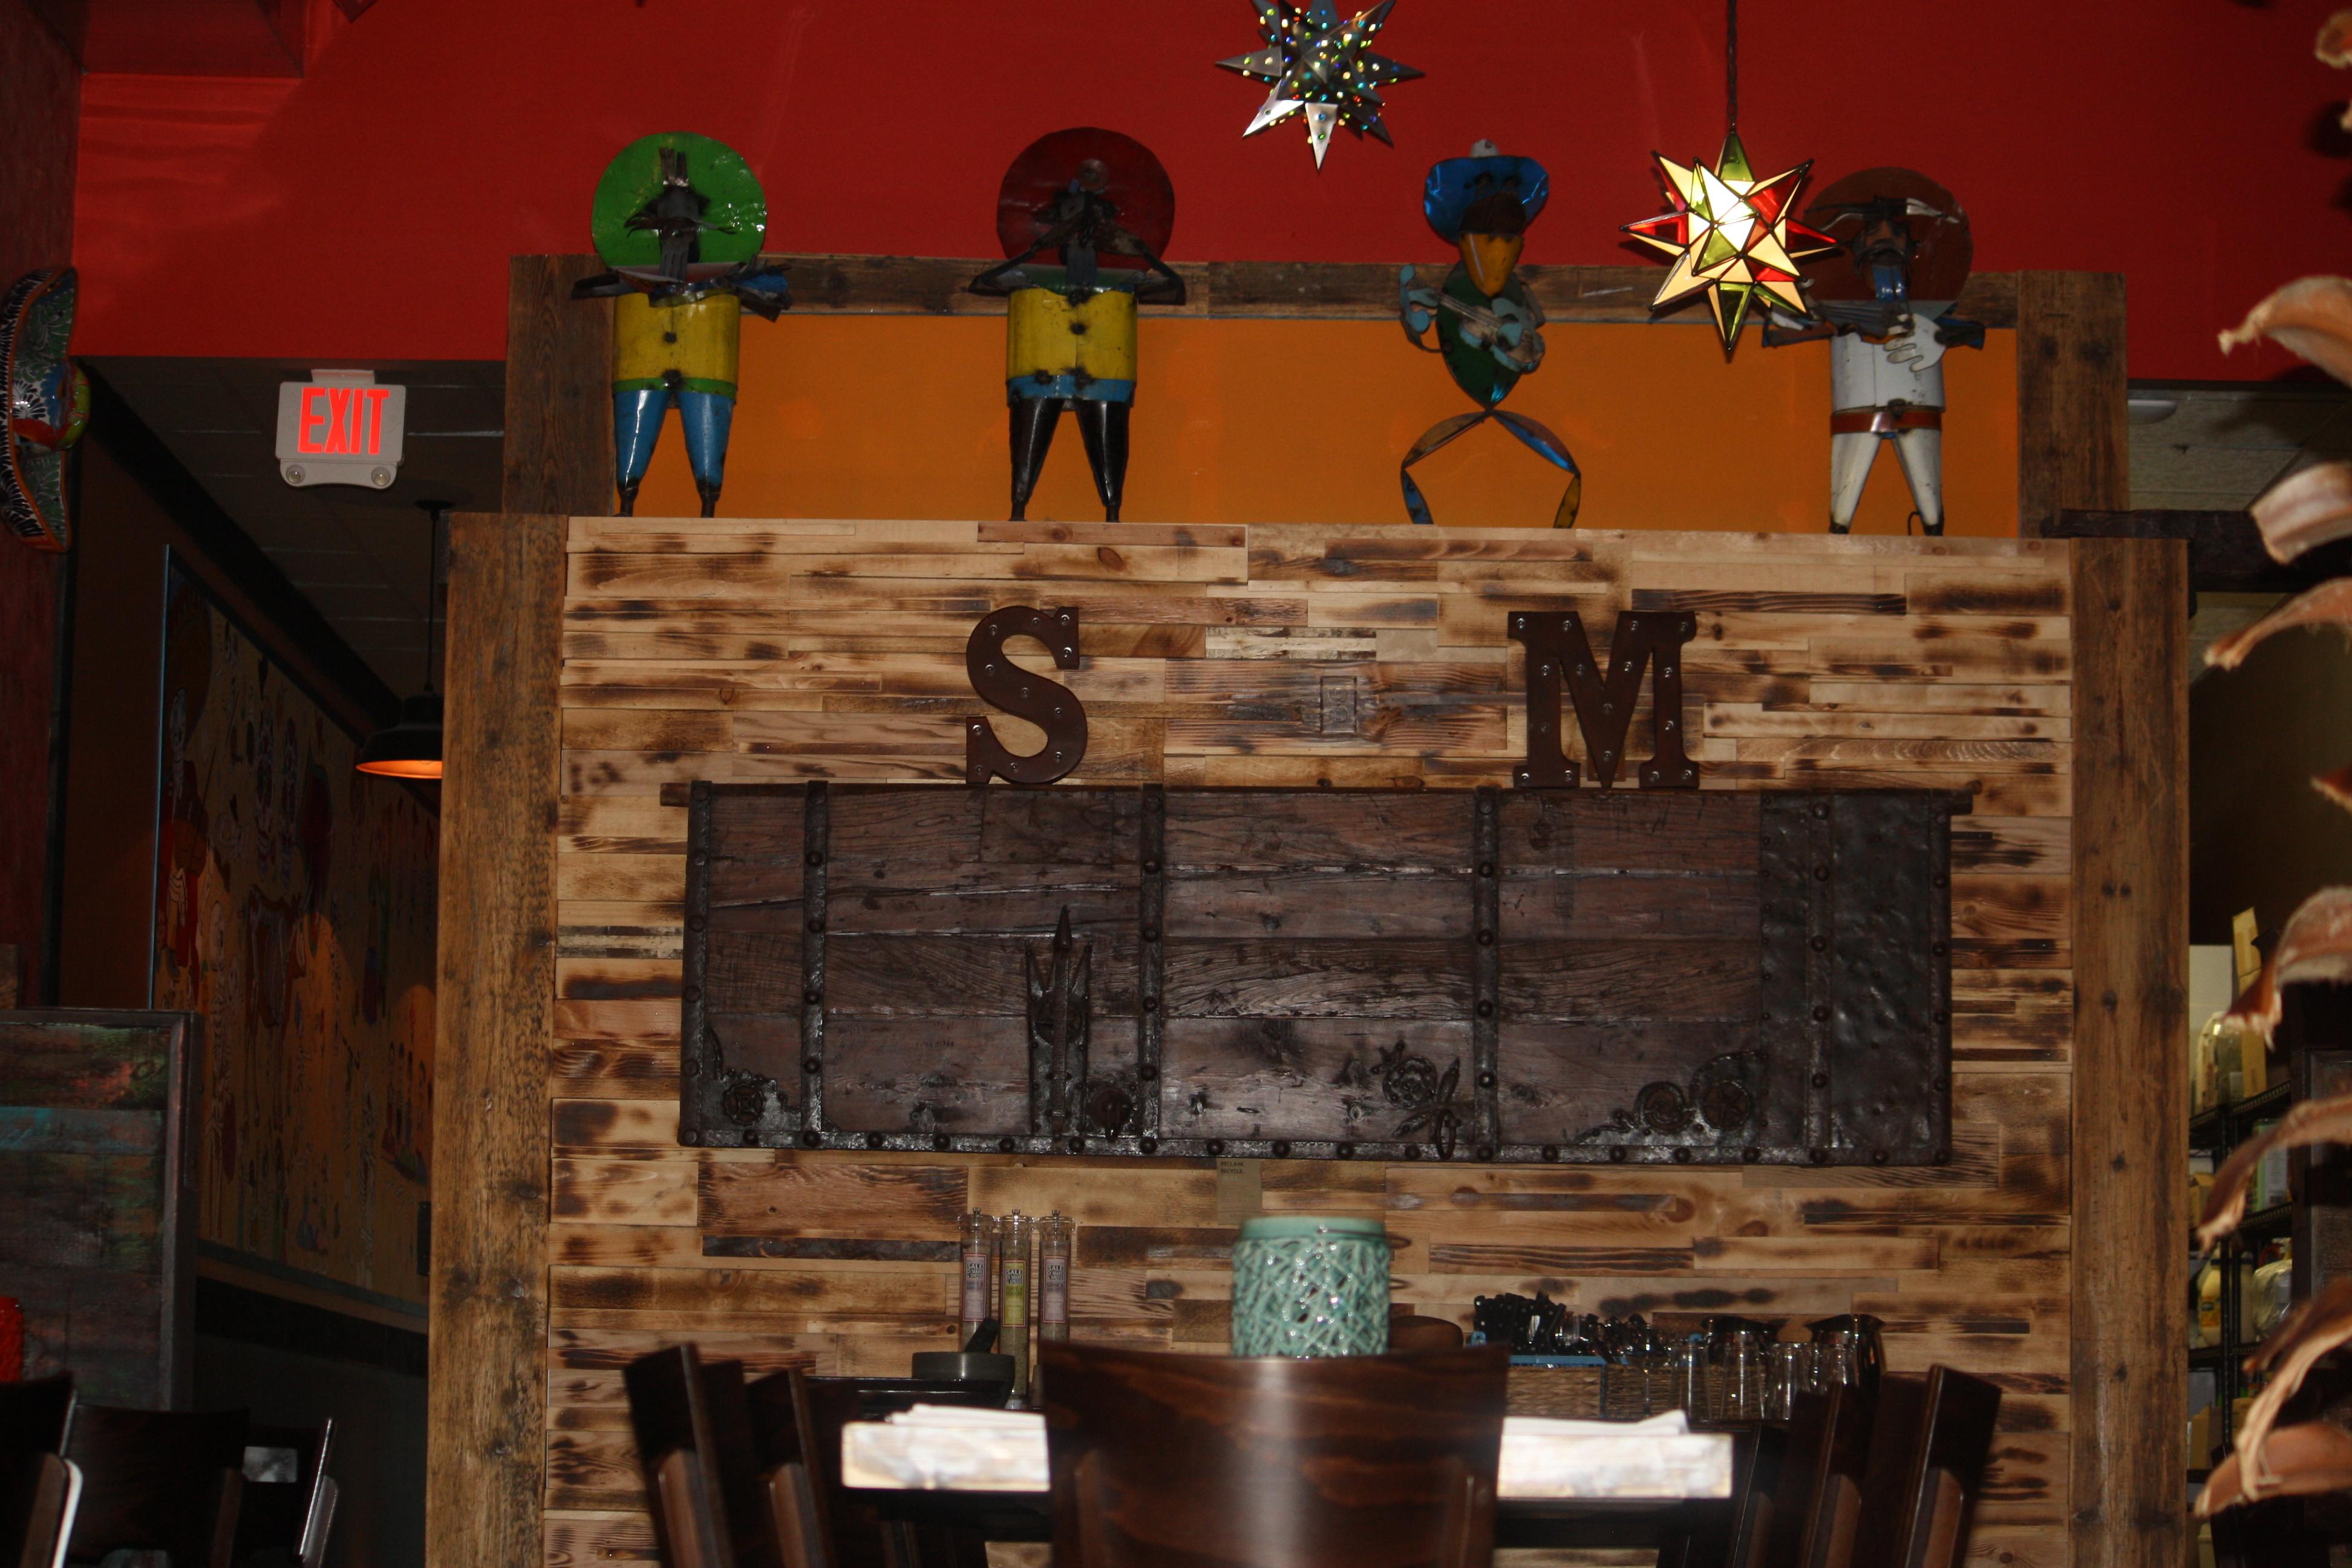 Salsa Mexicana dining room